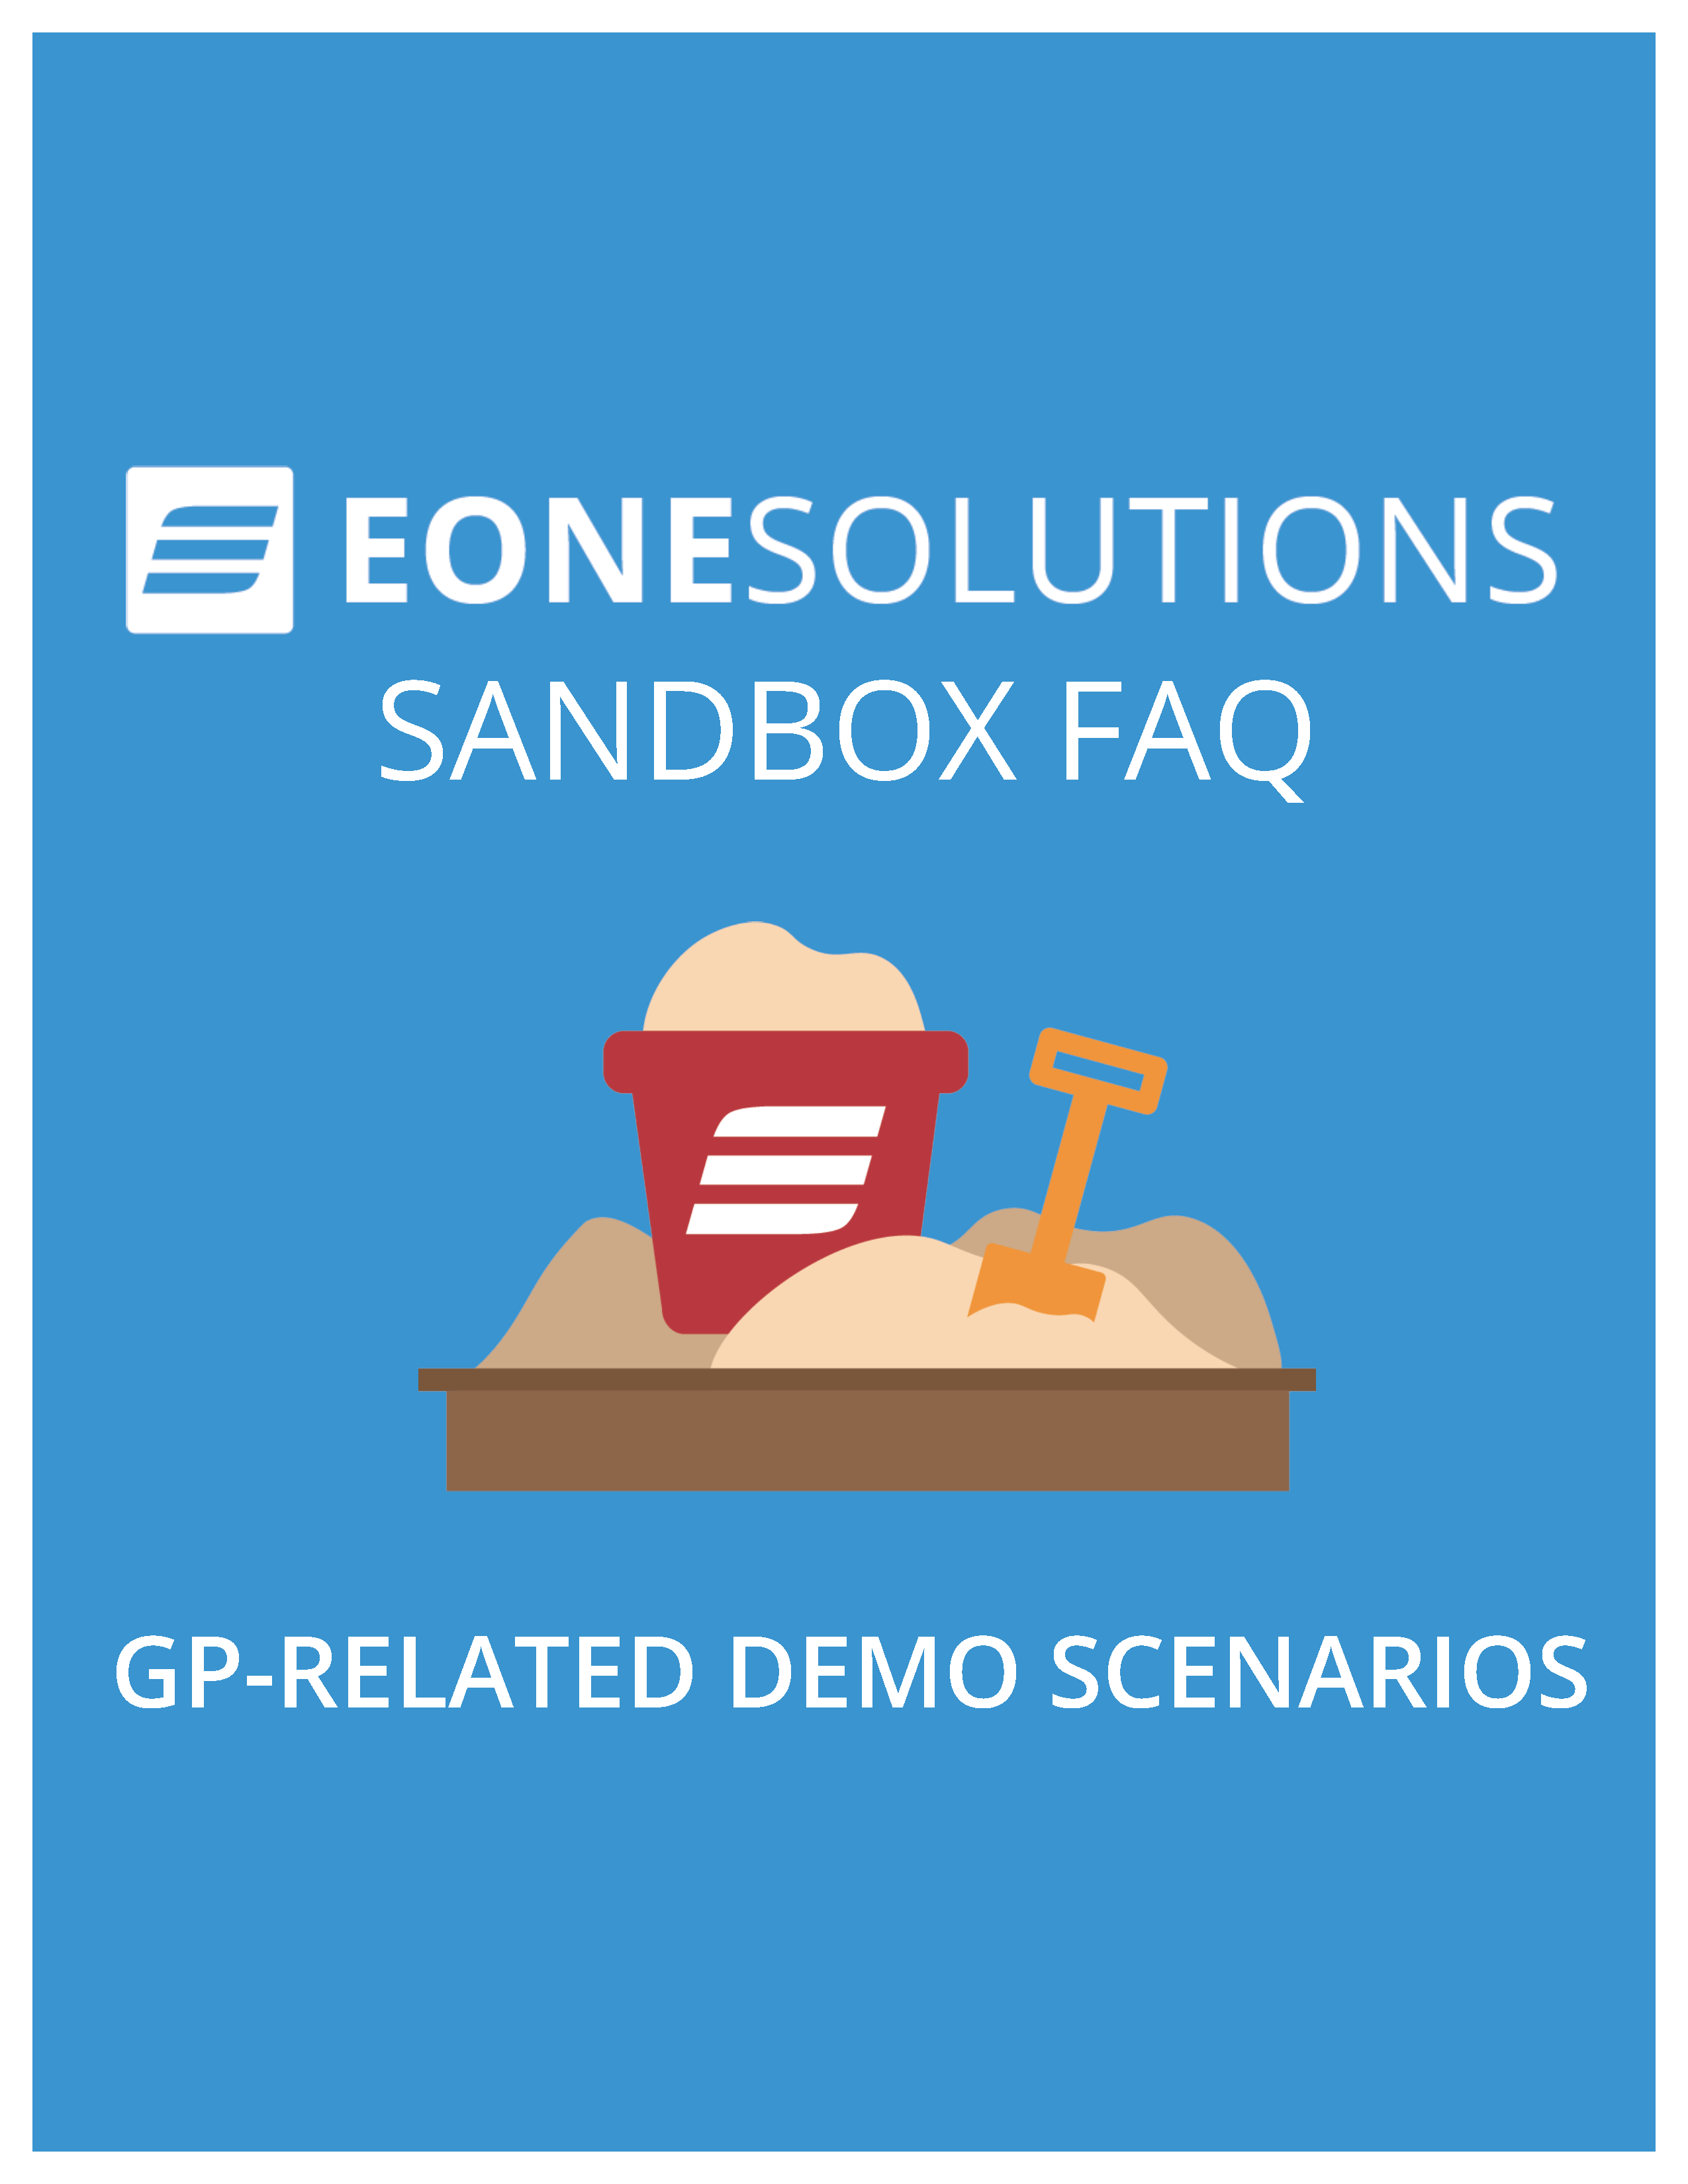 eOne Solutions Sandbox FAQ - GP-Related Demo Scenarios